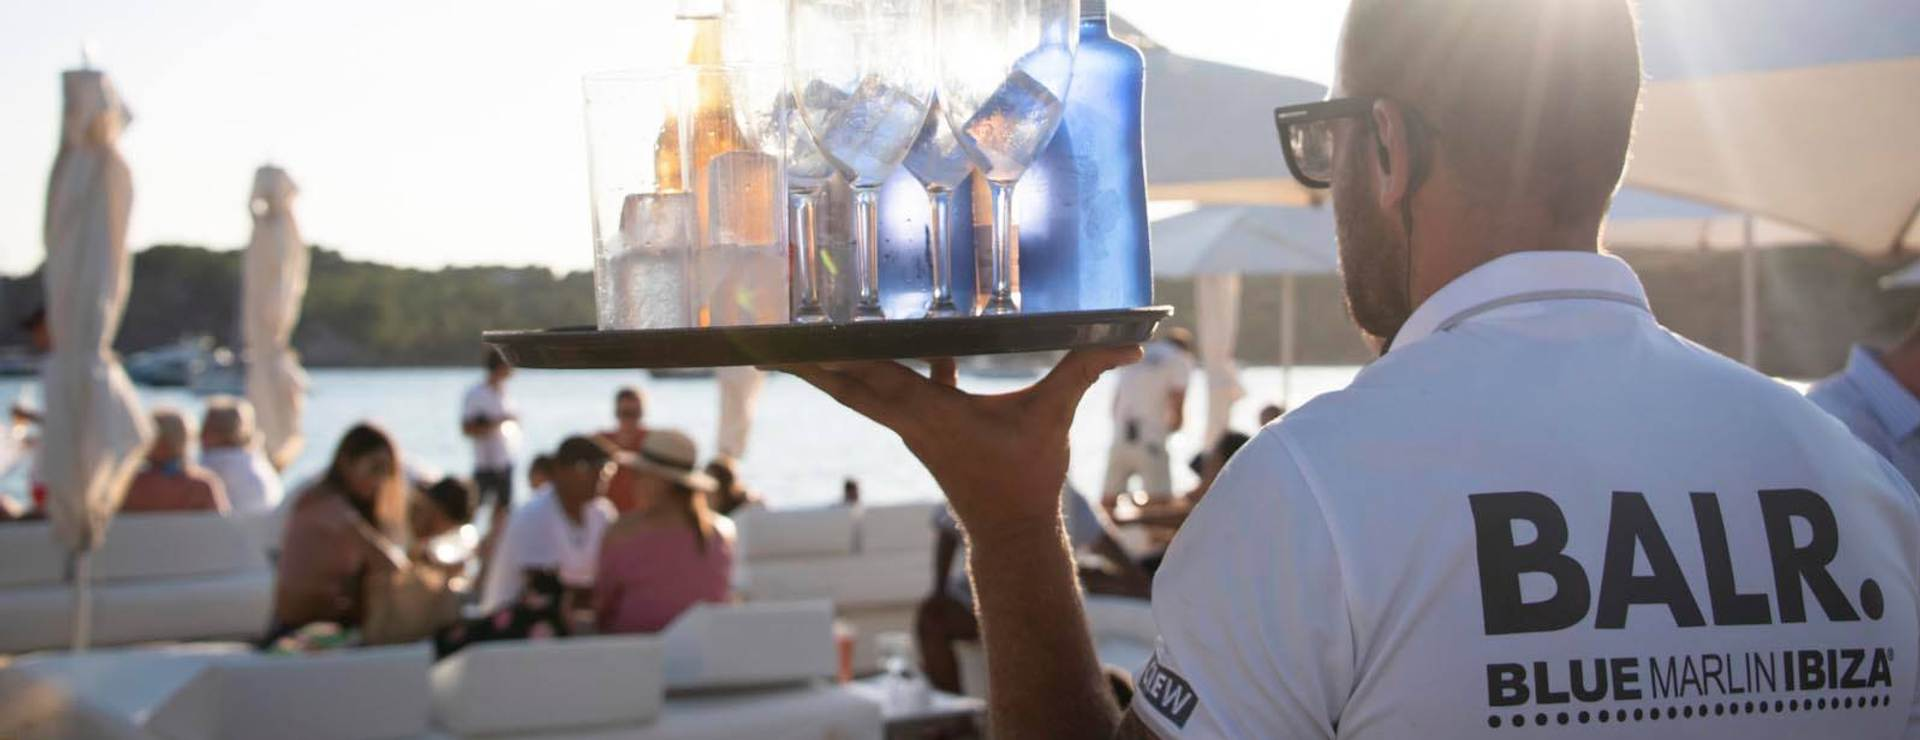 Blue Marlin, Ibiza Image 1